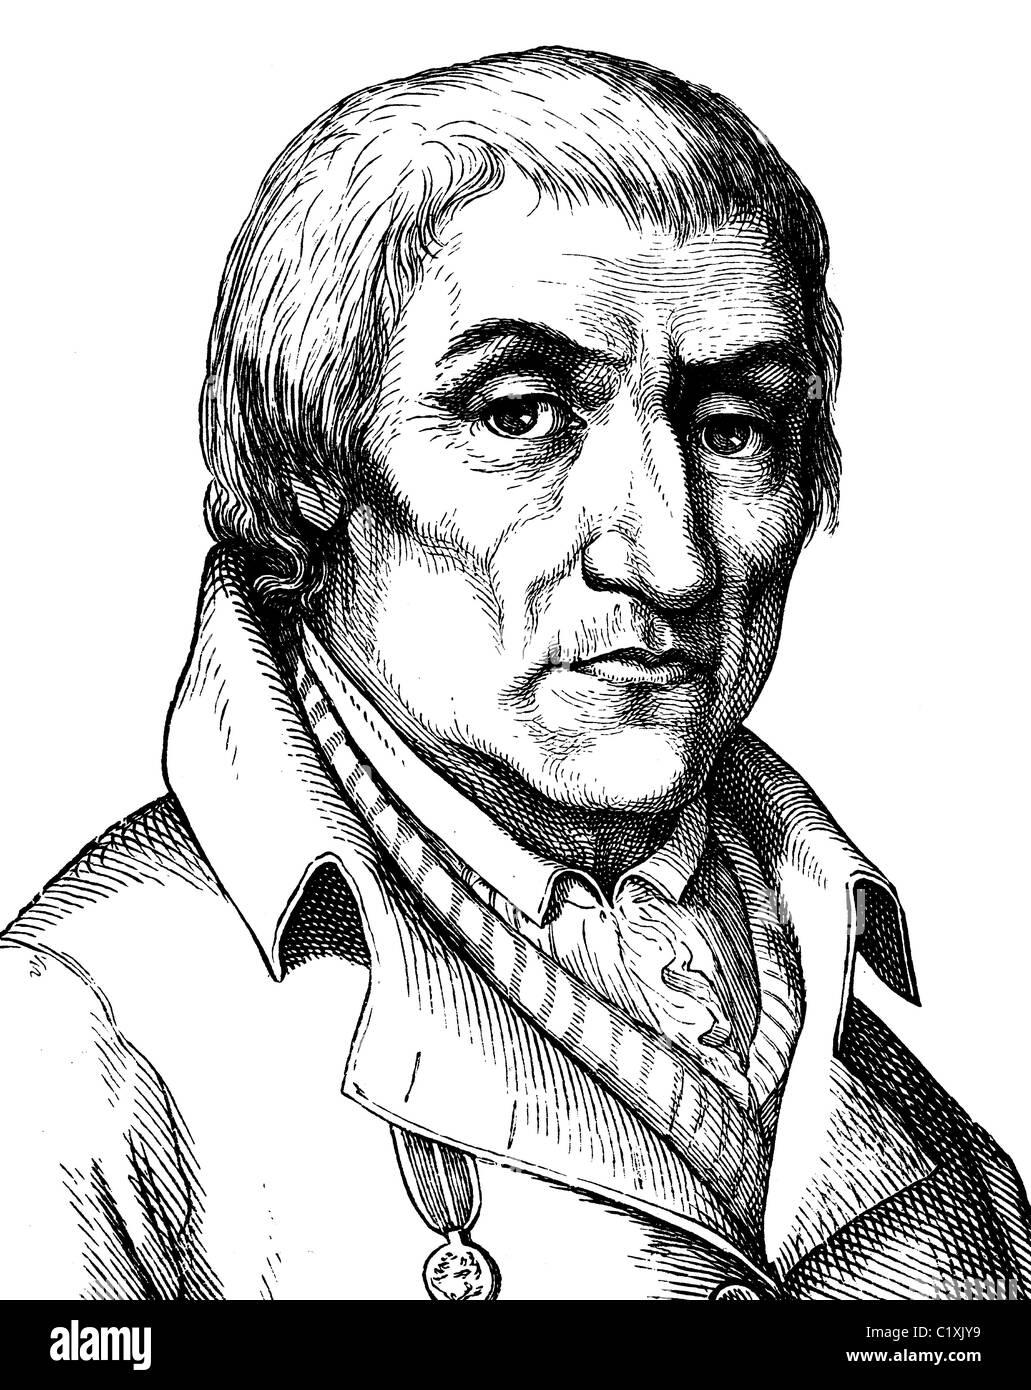 Digital improved image of Christian Joachim Nettelbeck, German folk hero, 1738 - 1824, portrait, historic illustration, Stock Photo